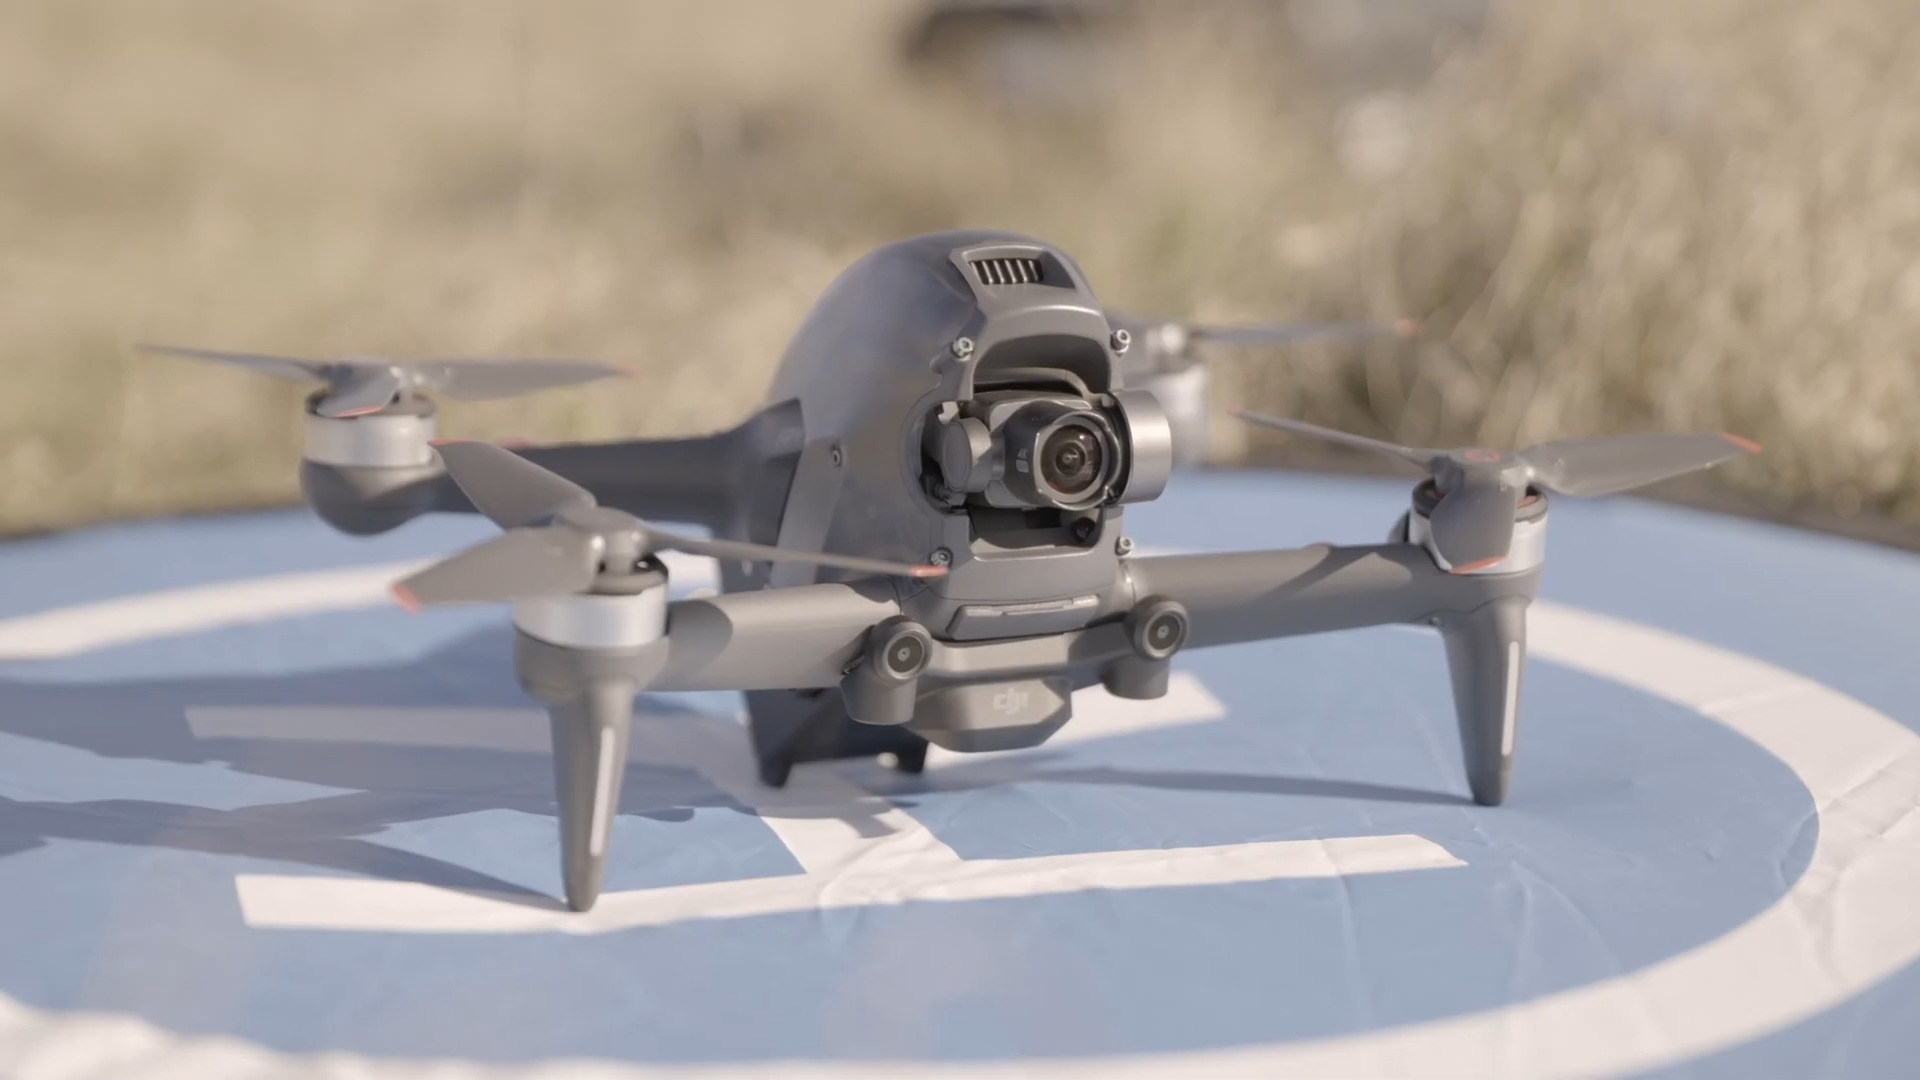 Test, Drohne, NewGadgets, Johannes Knapp, Unboxing, DJI, Quadrocopter, DJI FPV, Renndrohne, FPV-Brille